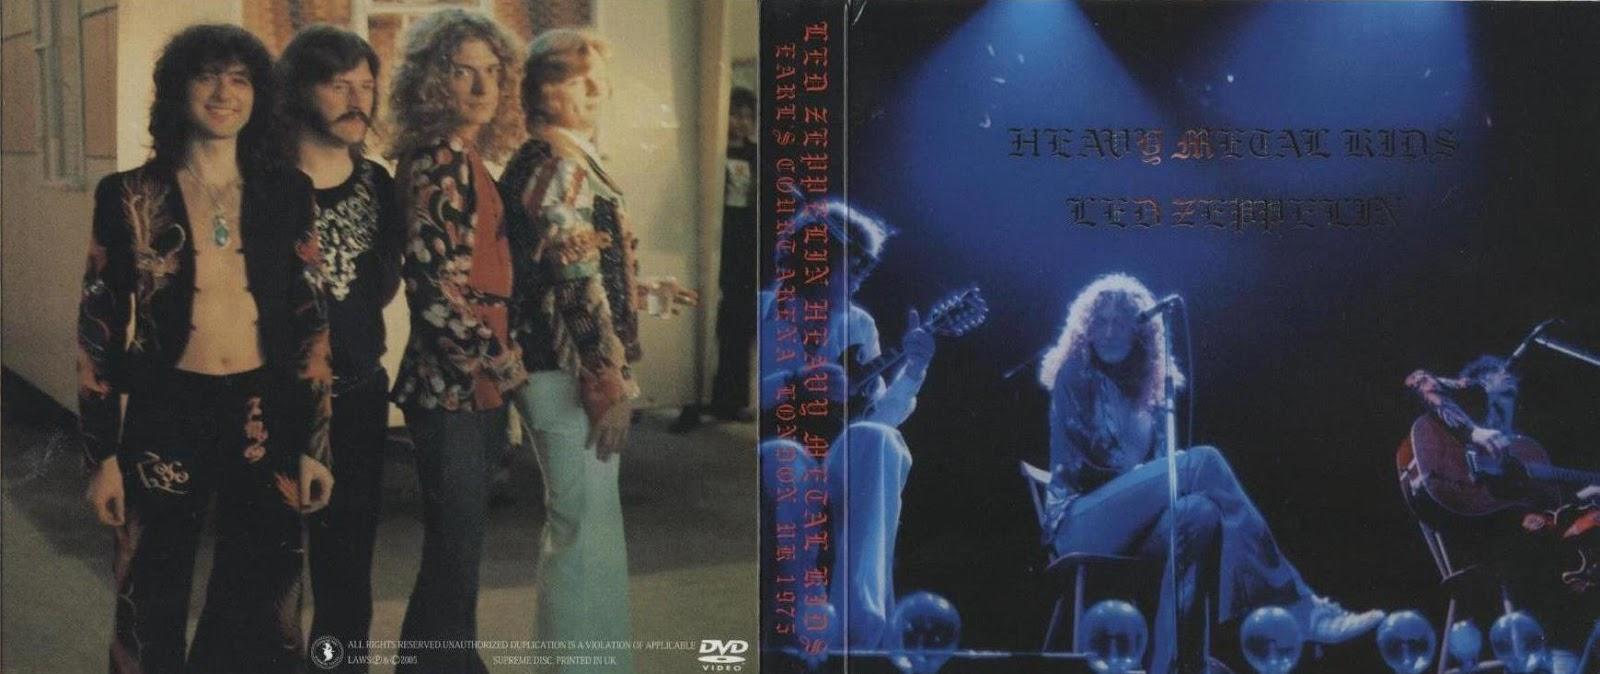 T.U.B.E.: Led Zeppelin - 1975-05-24/25 - London, UK ...